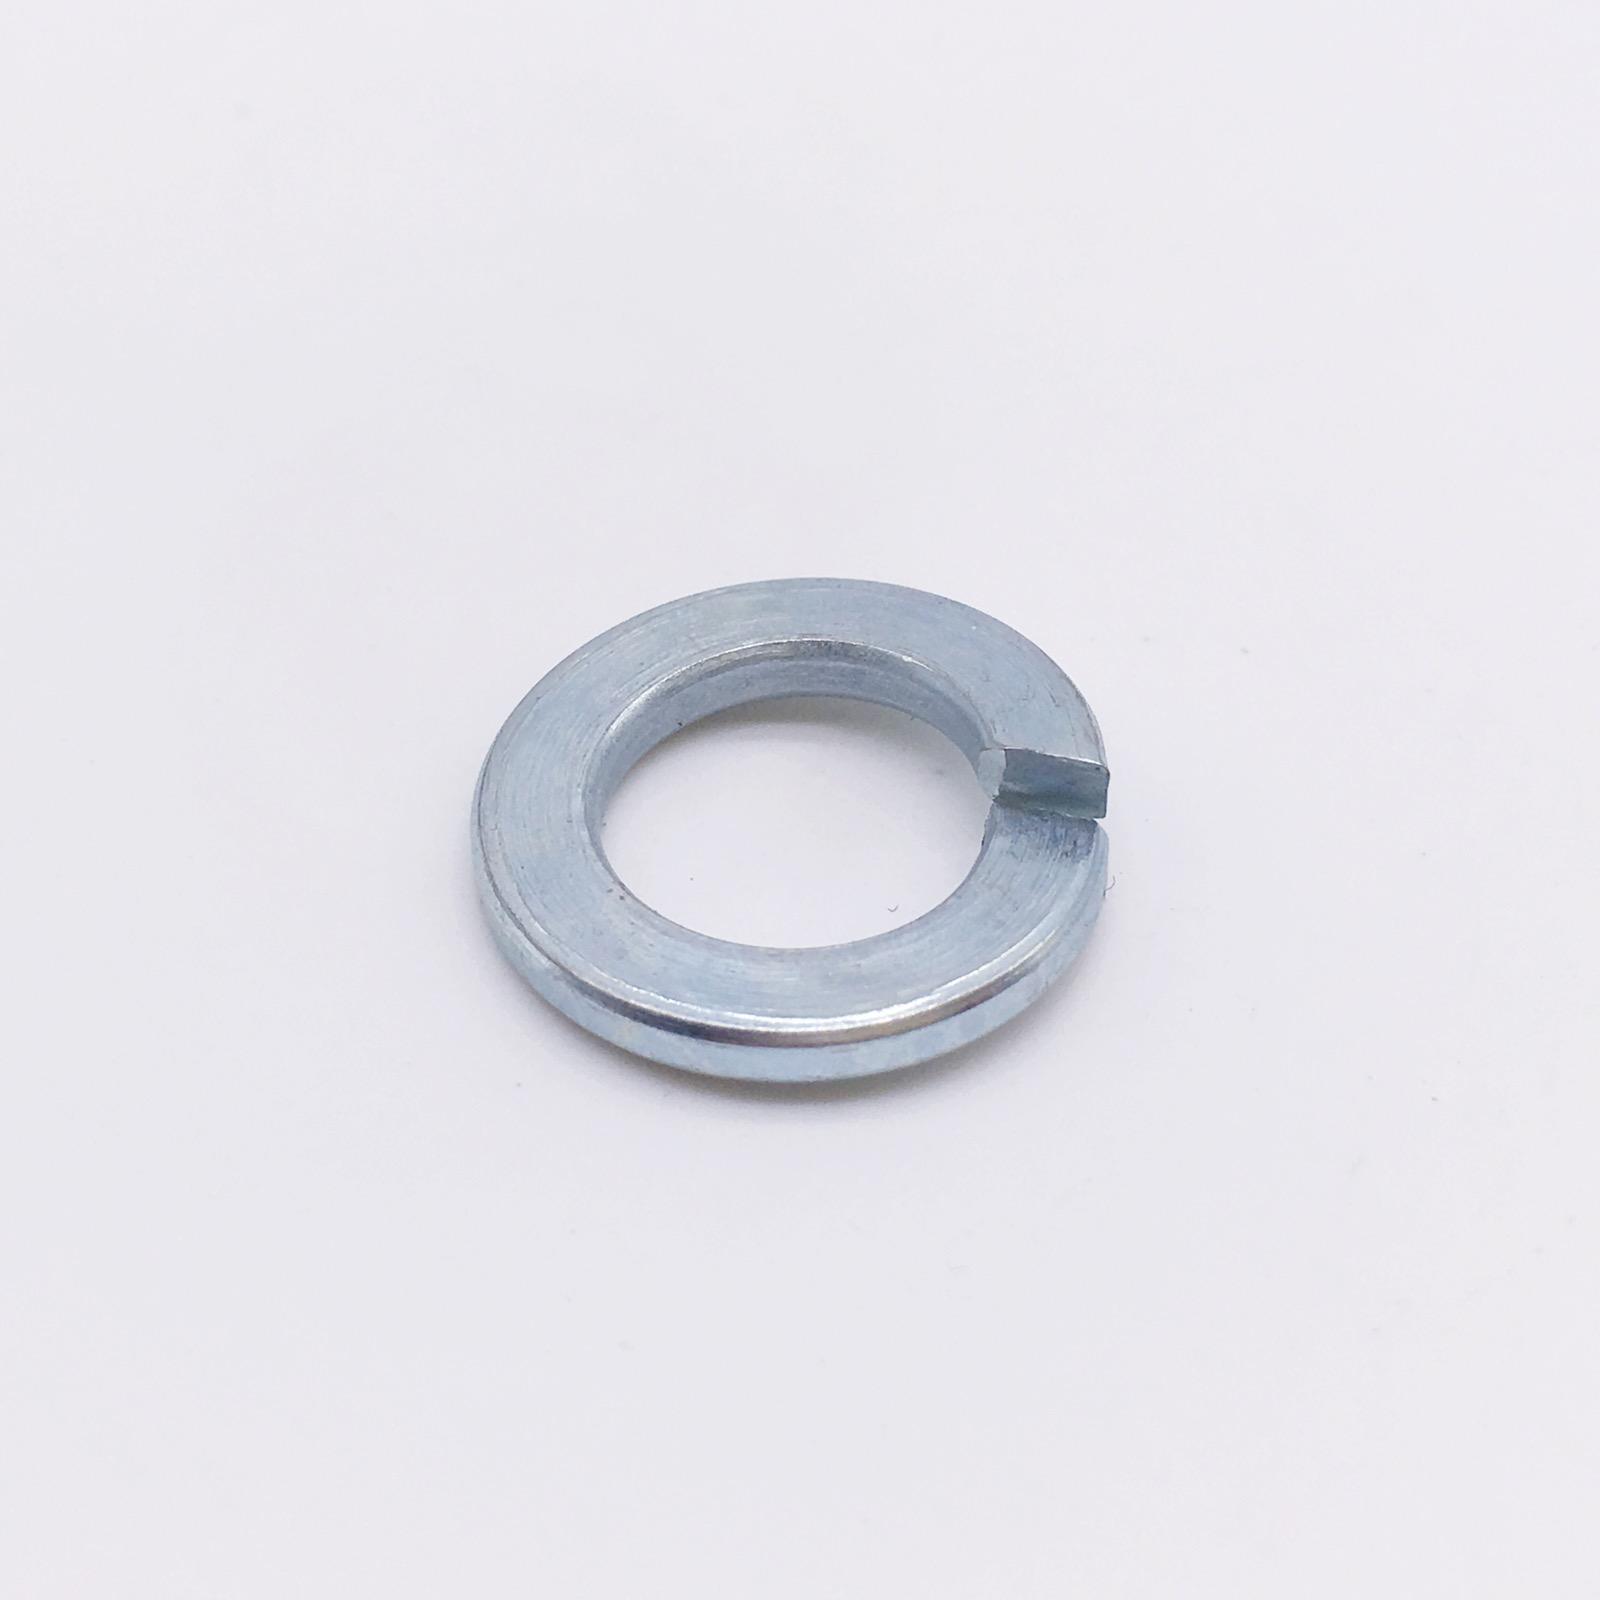 M4 spring washer split washer din127 carbon steel washer galvanized 5000 pieces(China (Mainland))